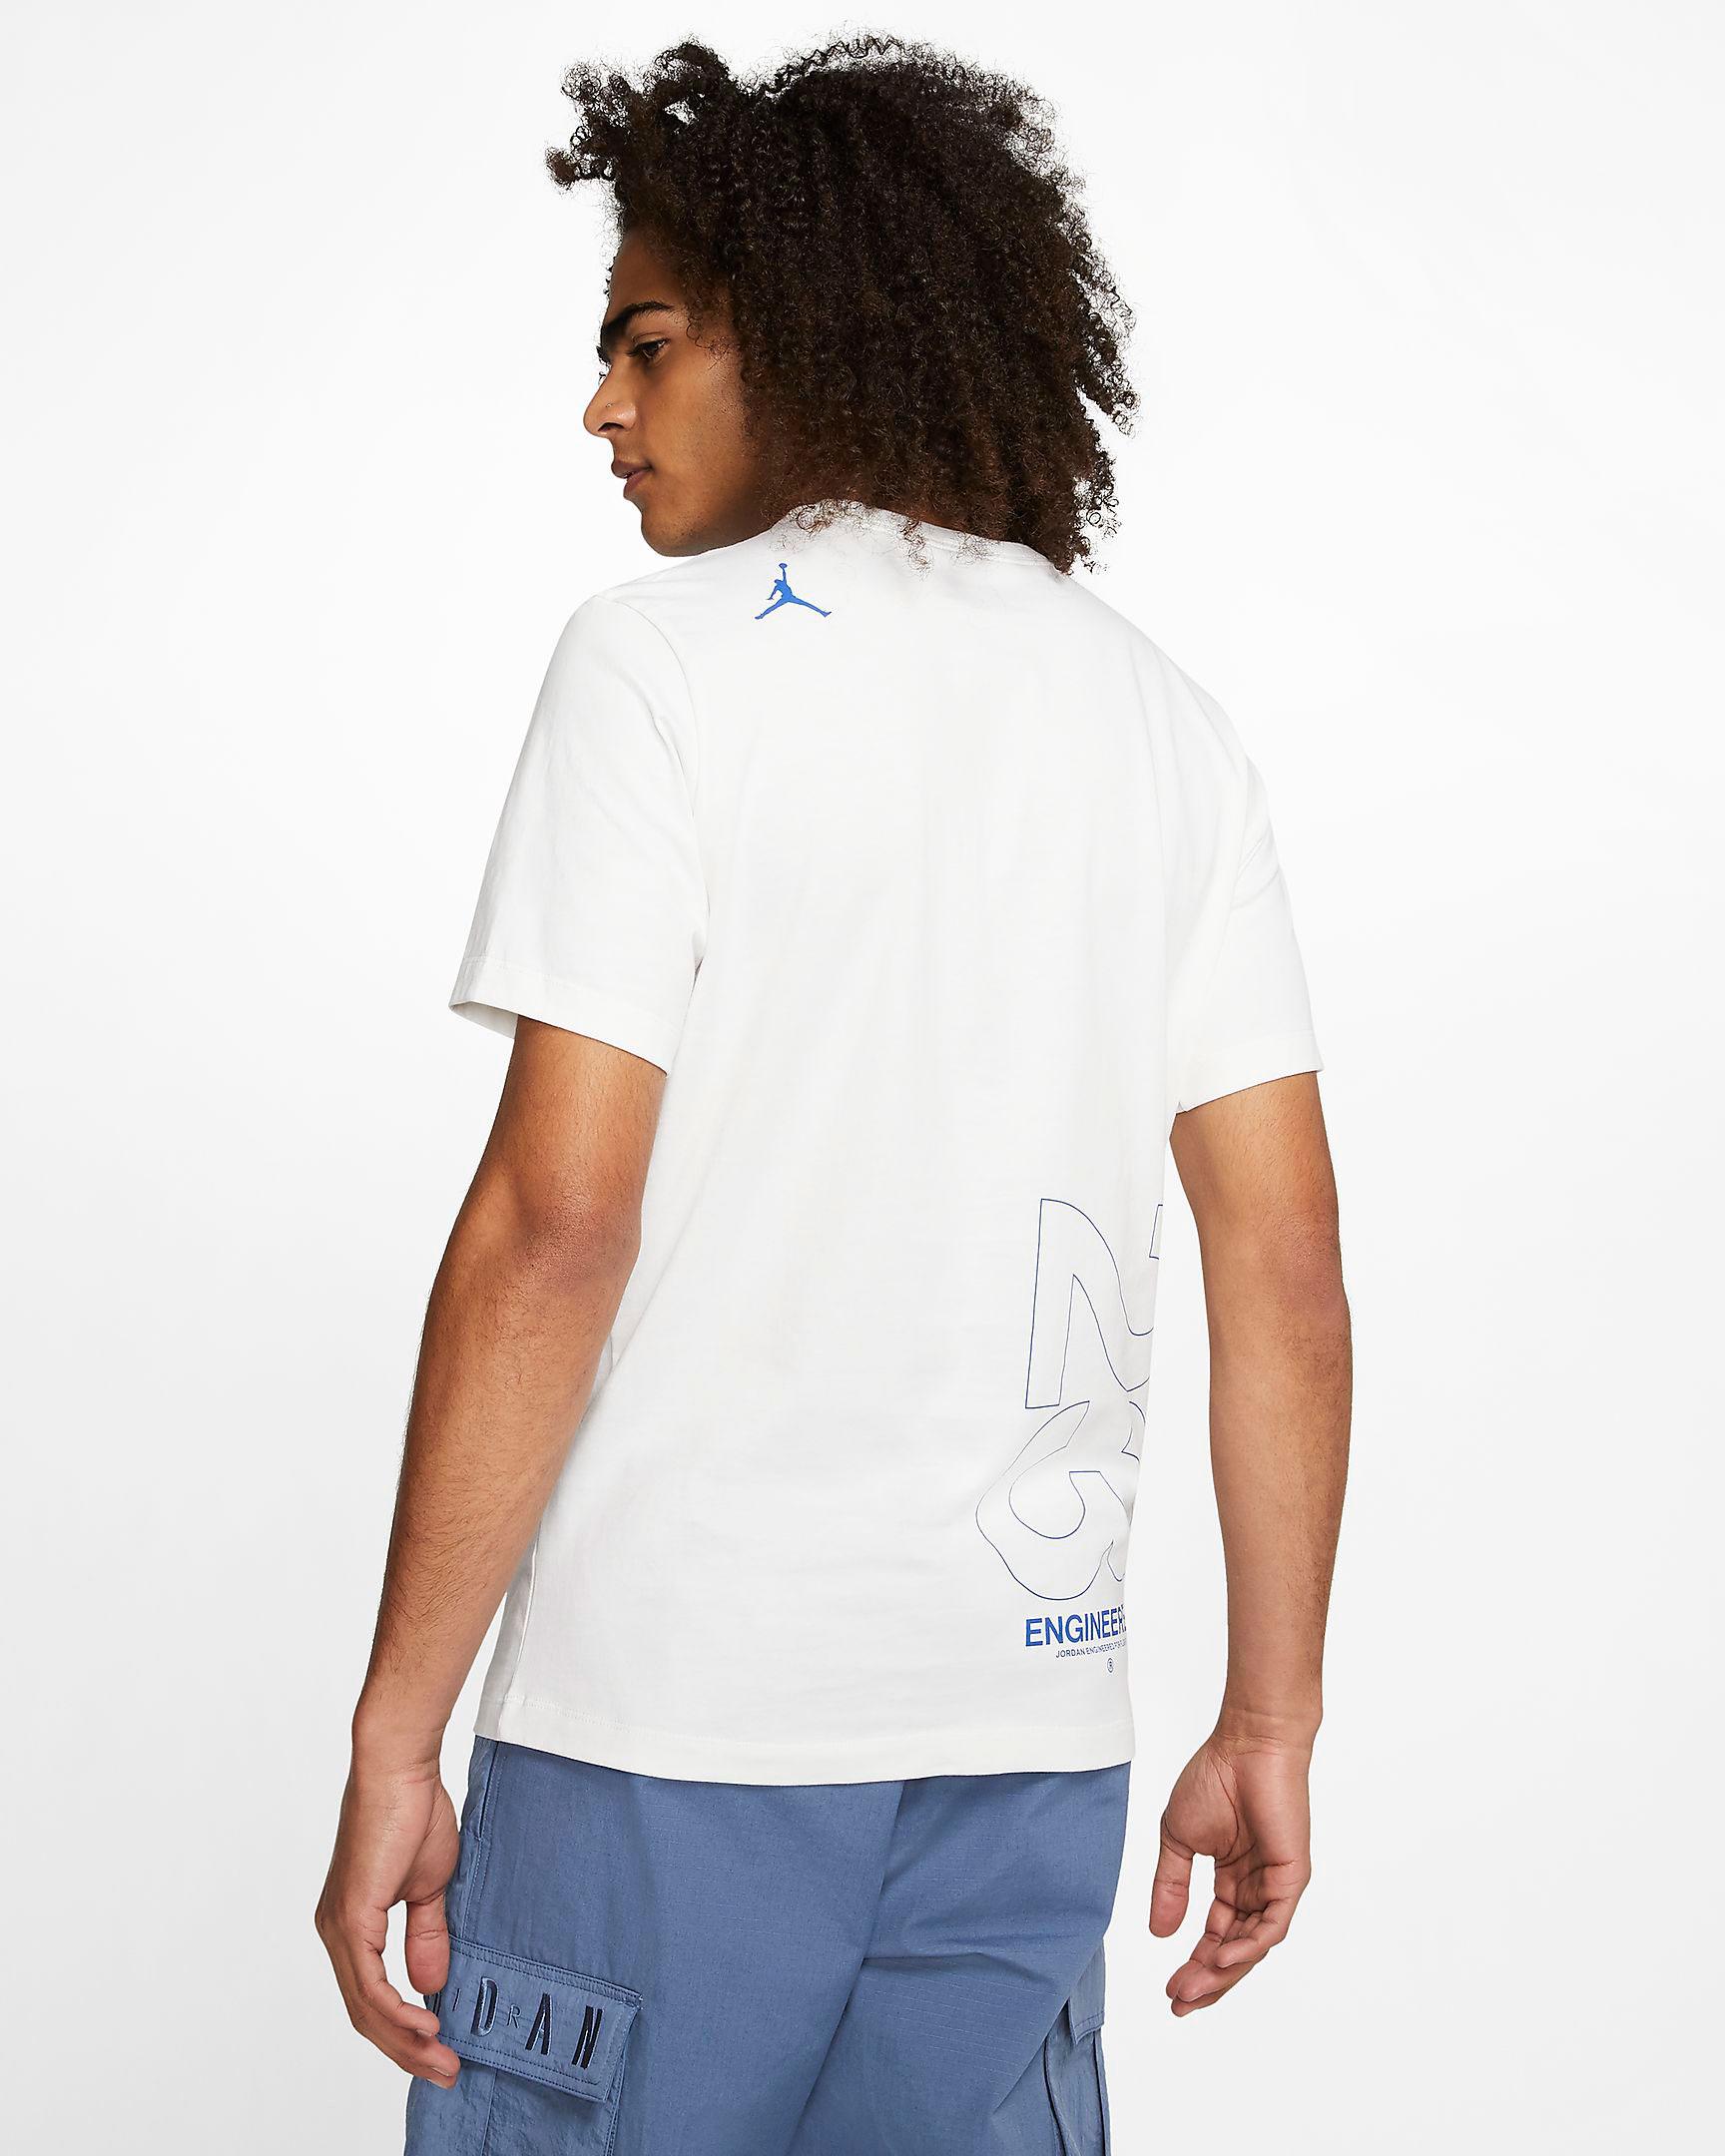 jordan-aerospace-720-lyrical-lemondade-tee-shirt-match-2